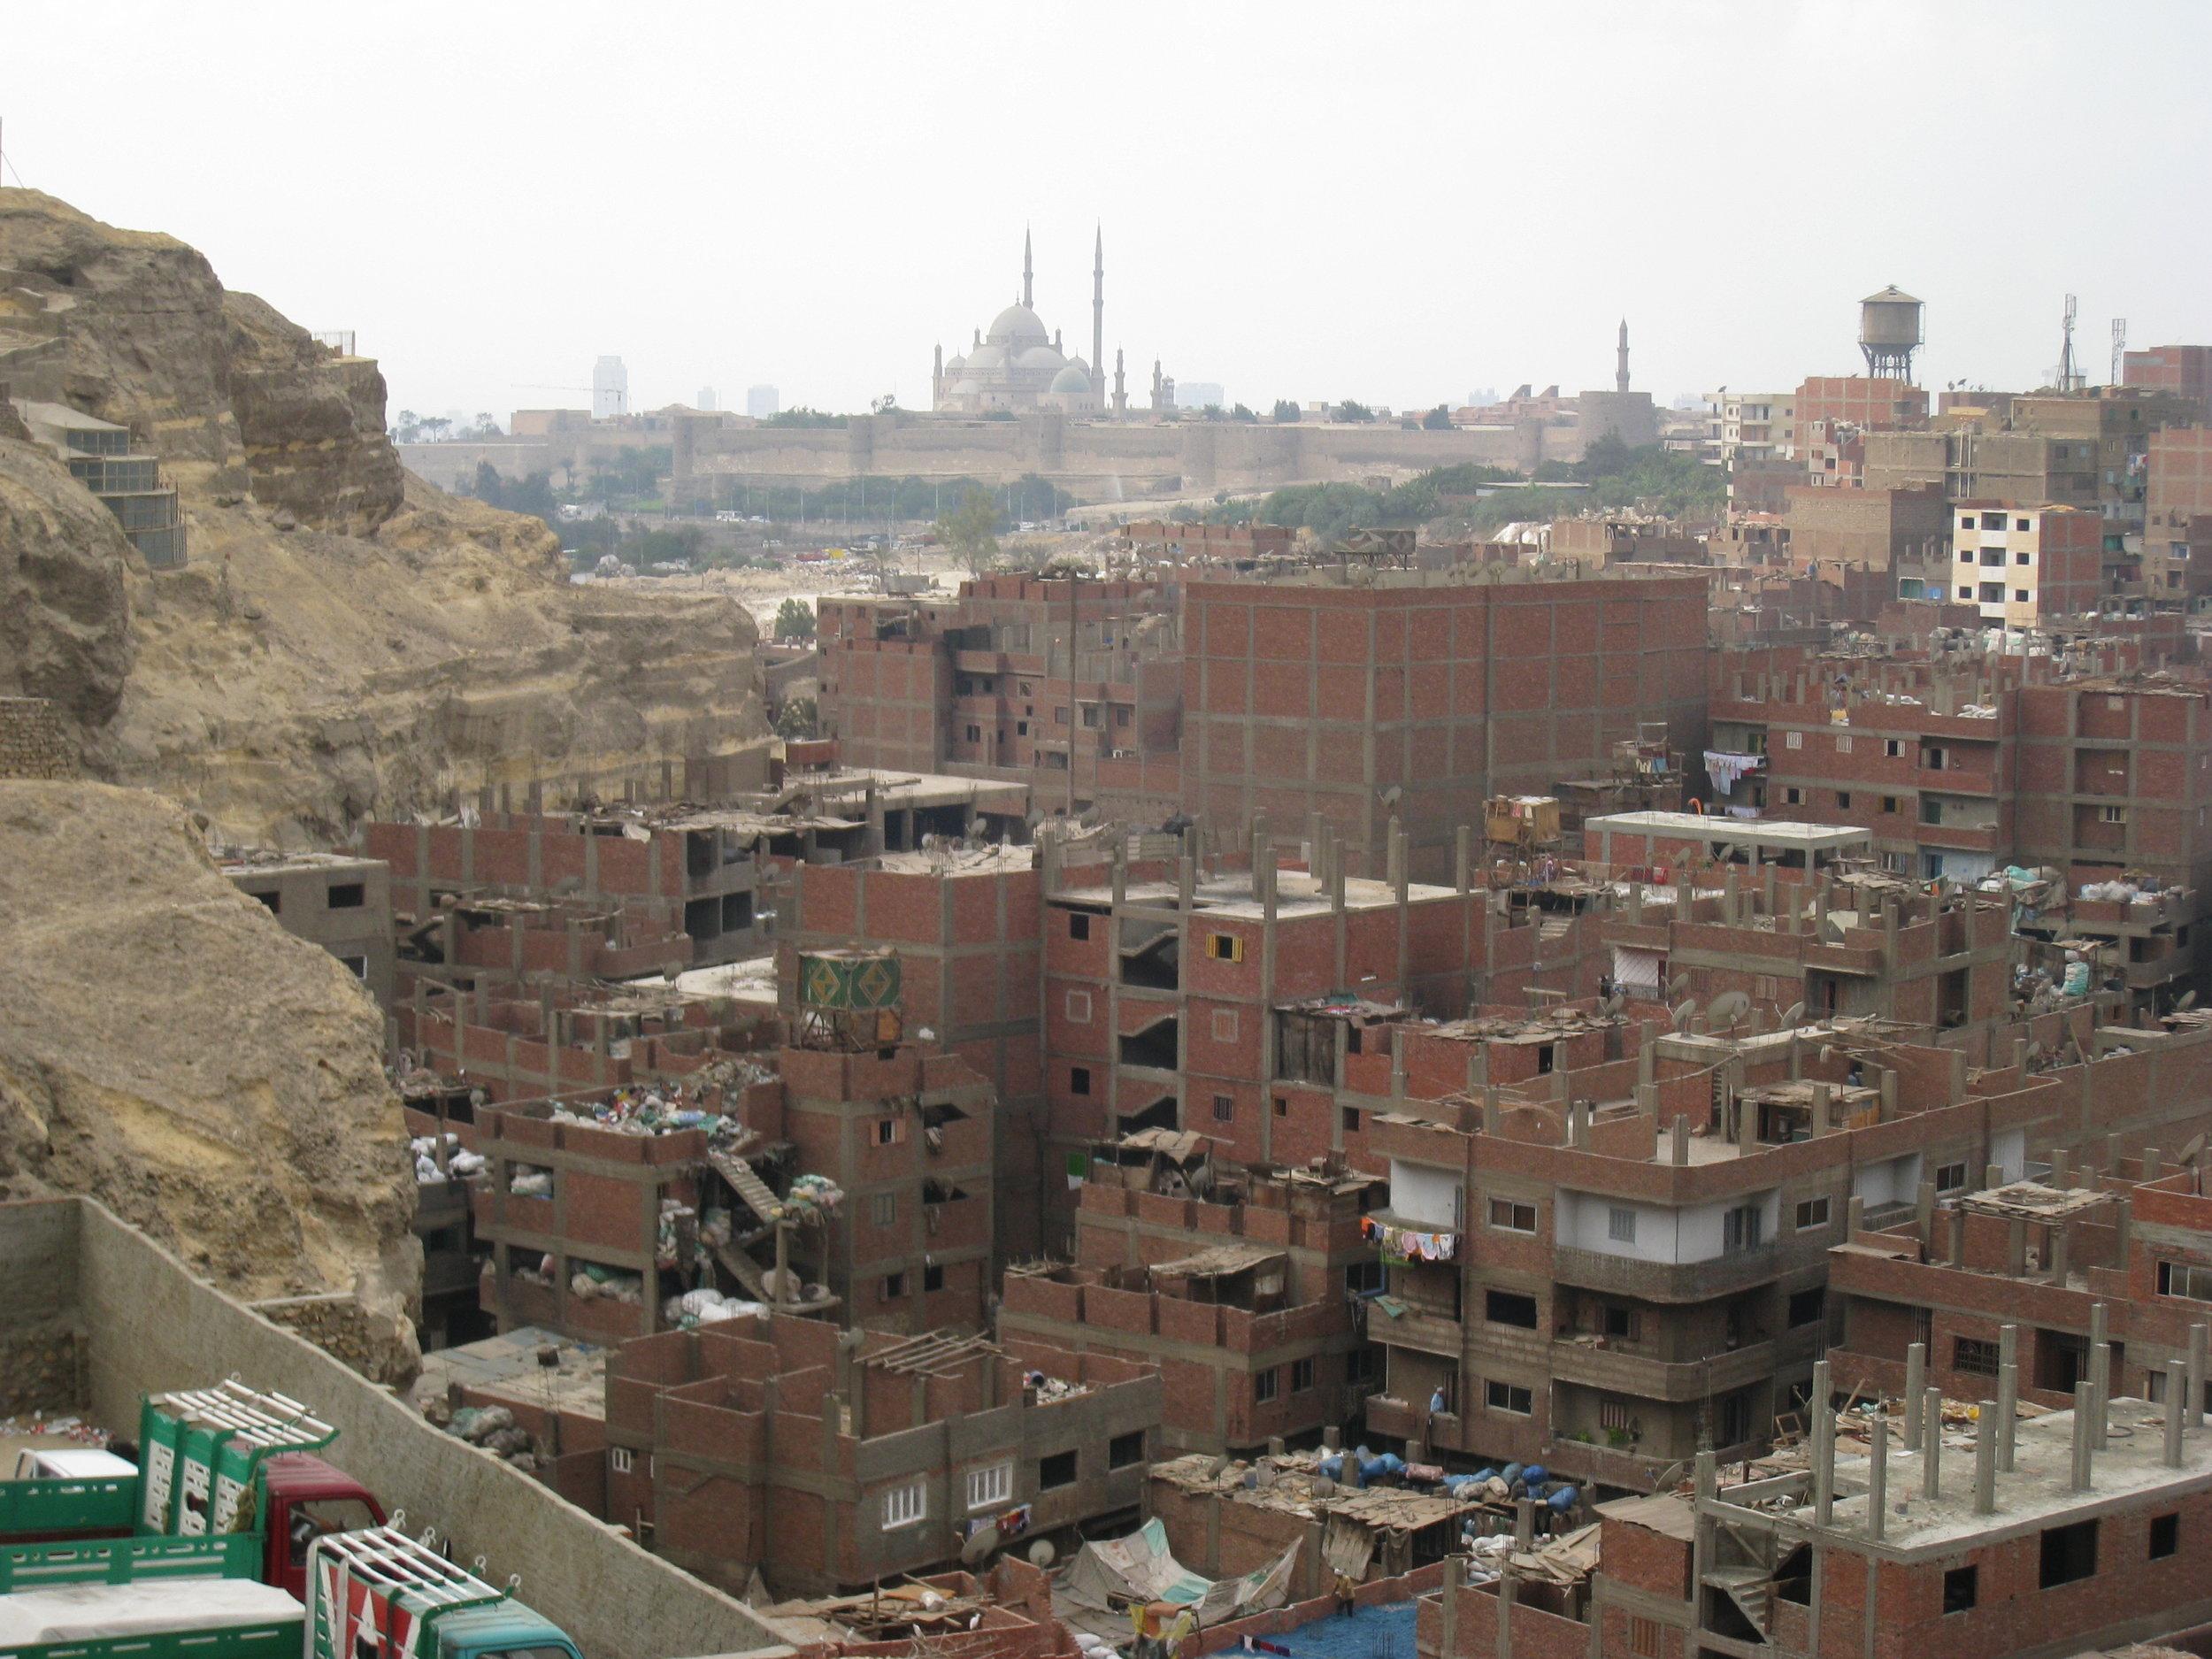 Citadel as seen from Nasr City